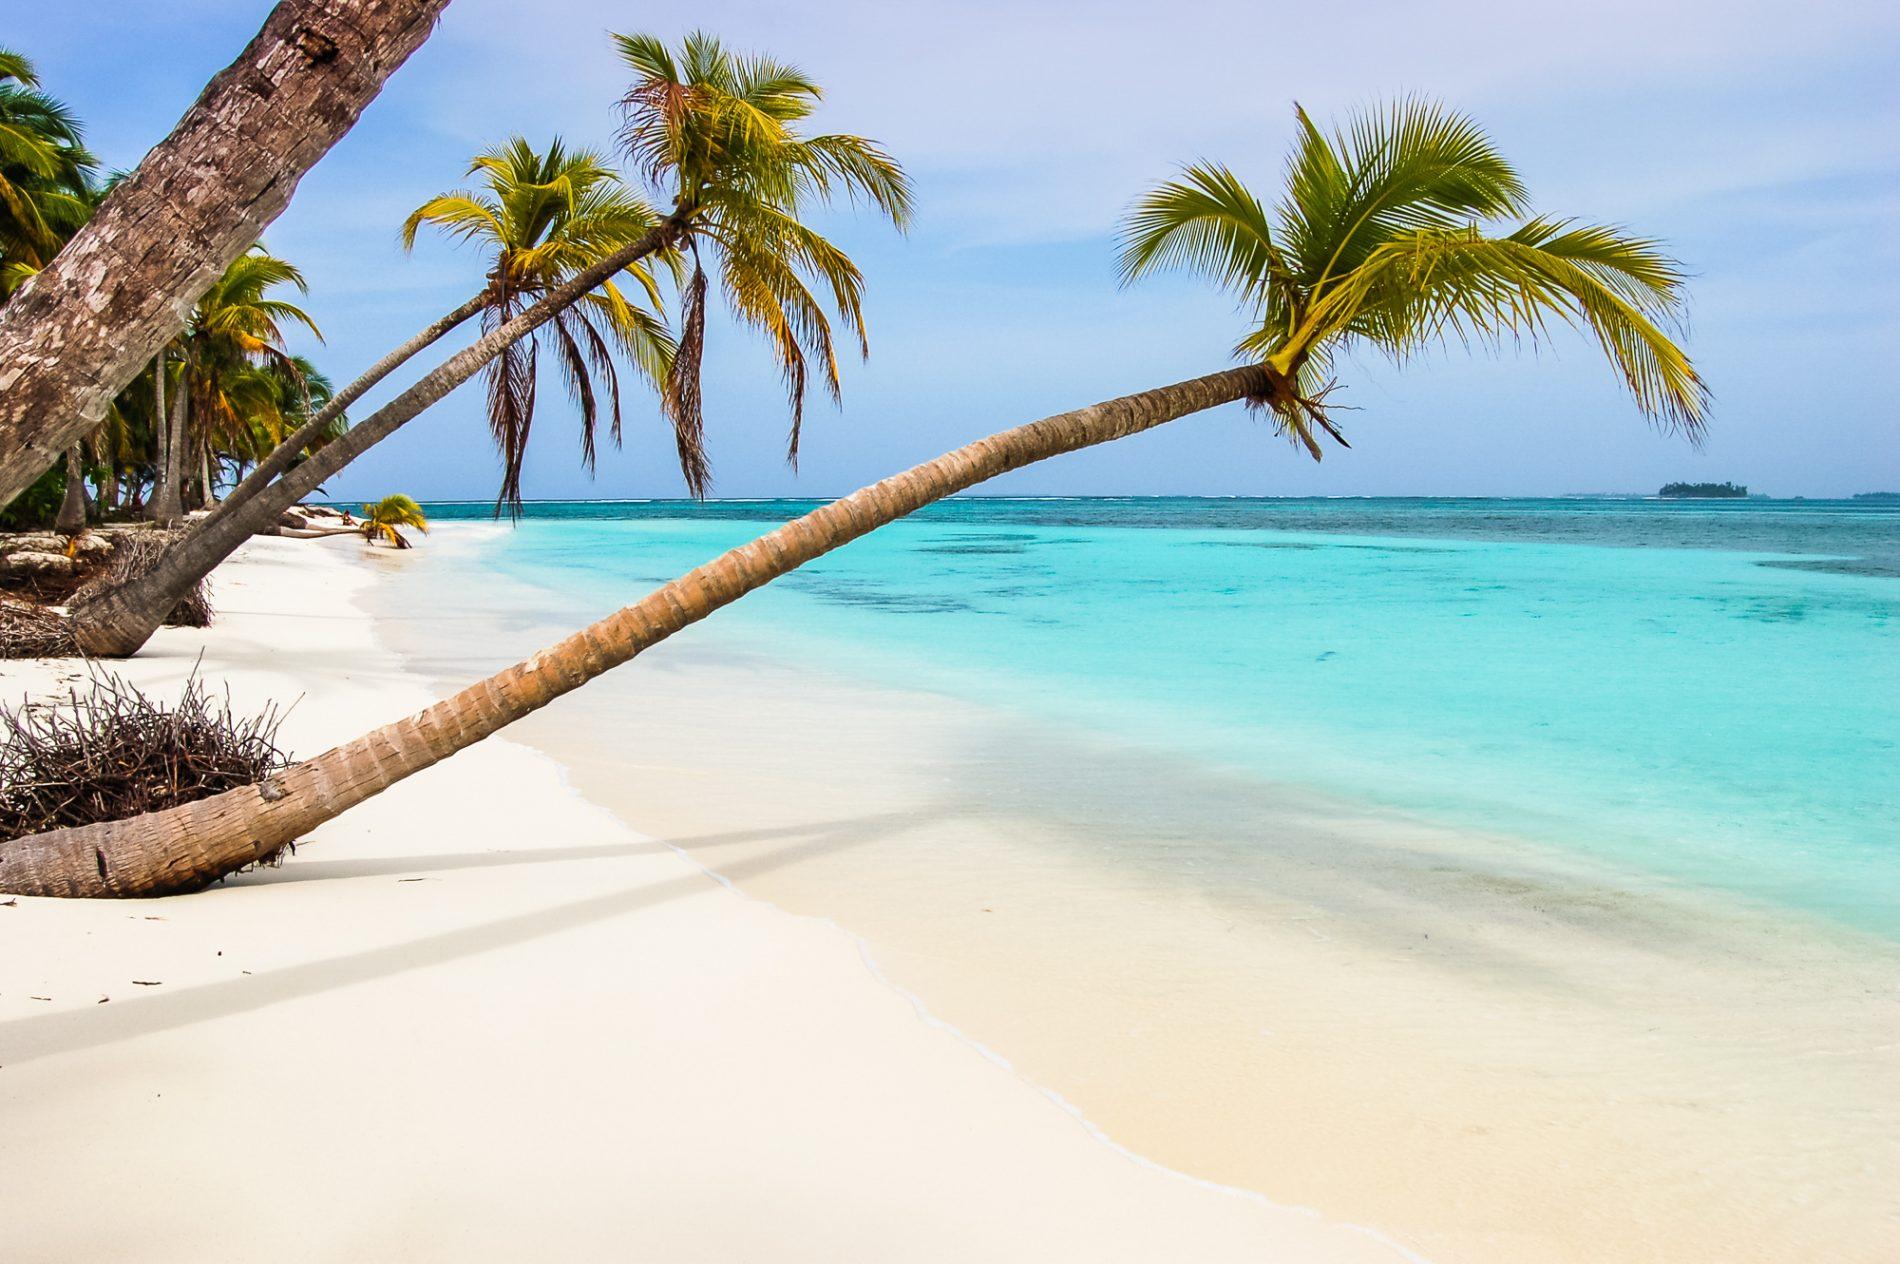 Isla Chirime in the San Blas archipelago off the Caribbean coast of Panama